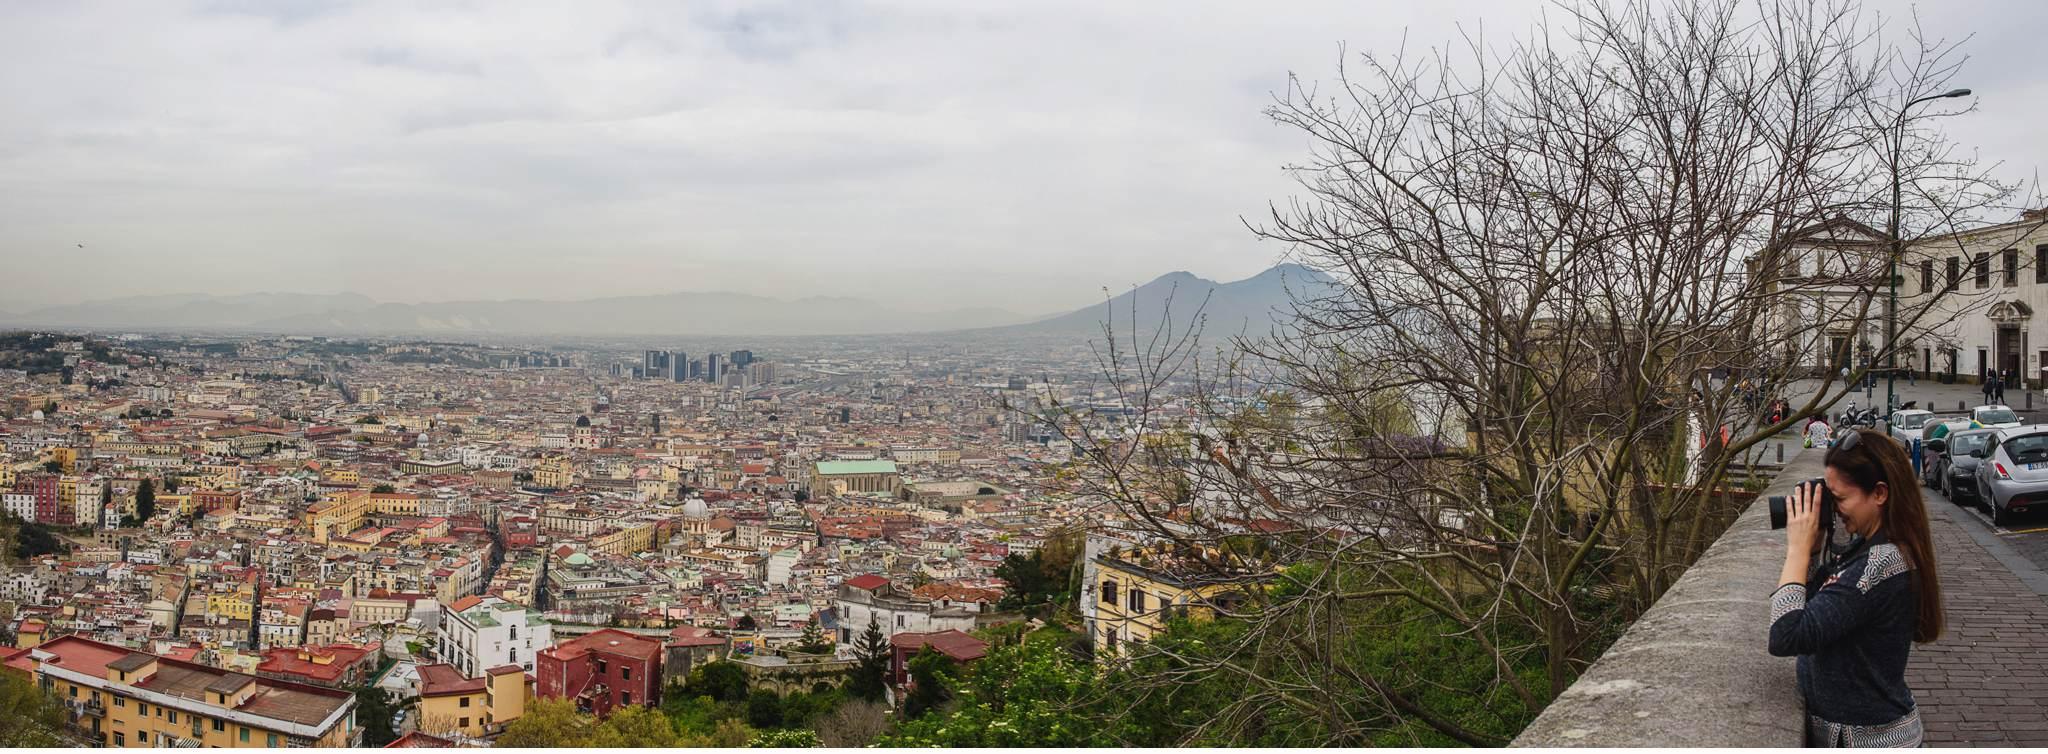 Neapel Panorama - Marion Marema by Daniel Kempf Seifried Kopie